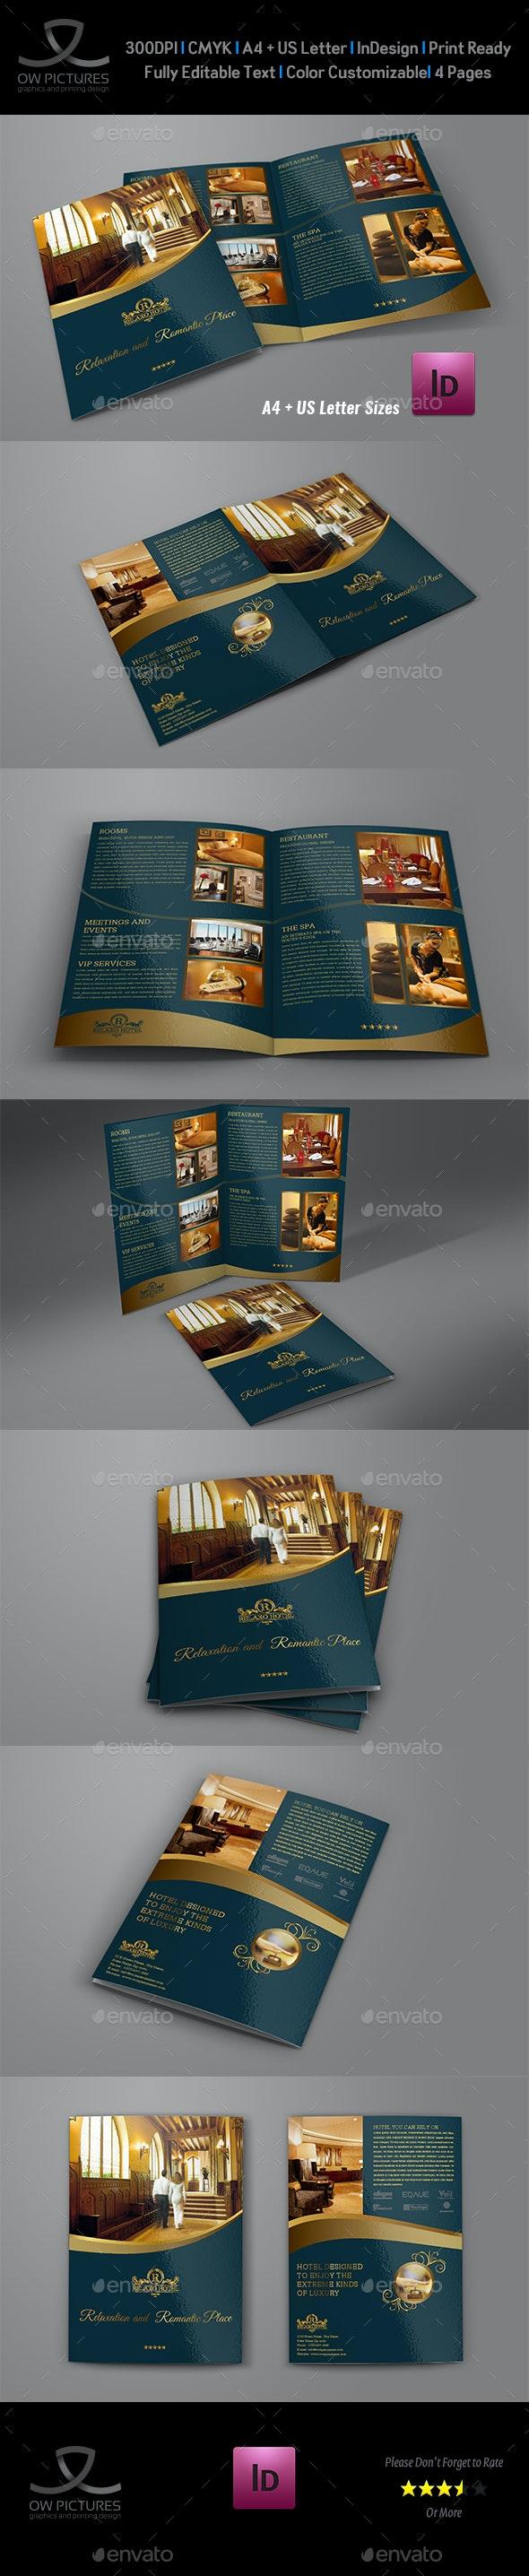 Hotel and Motel Bi-Fold Brochure Template Vol.2 - Brochures Print Templates